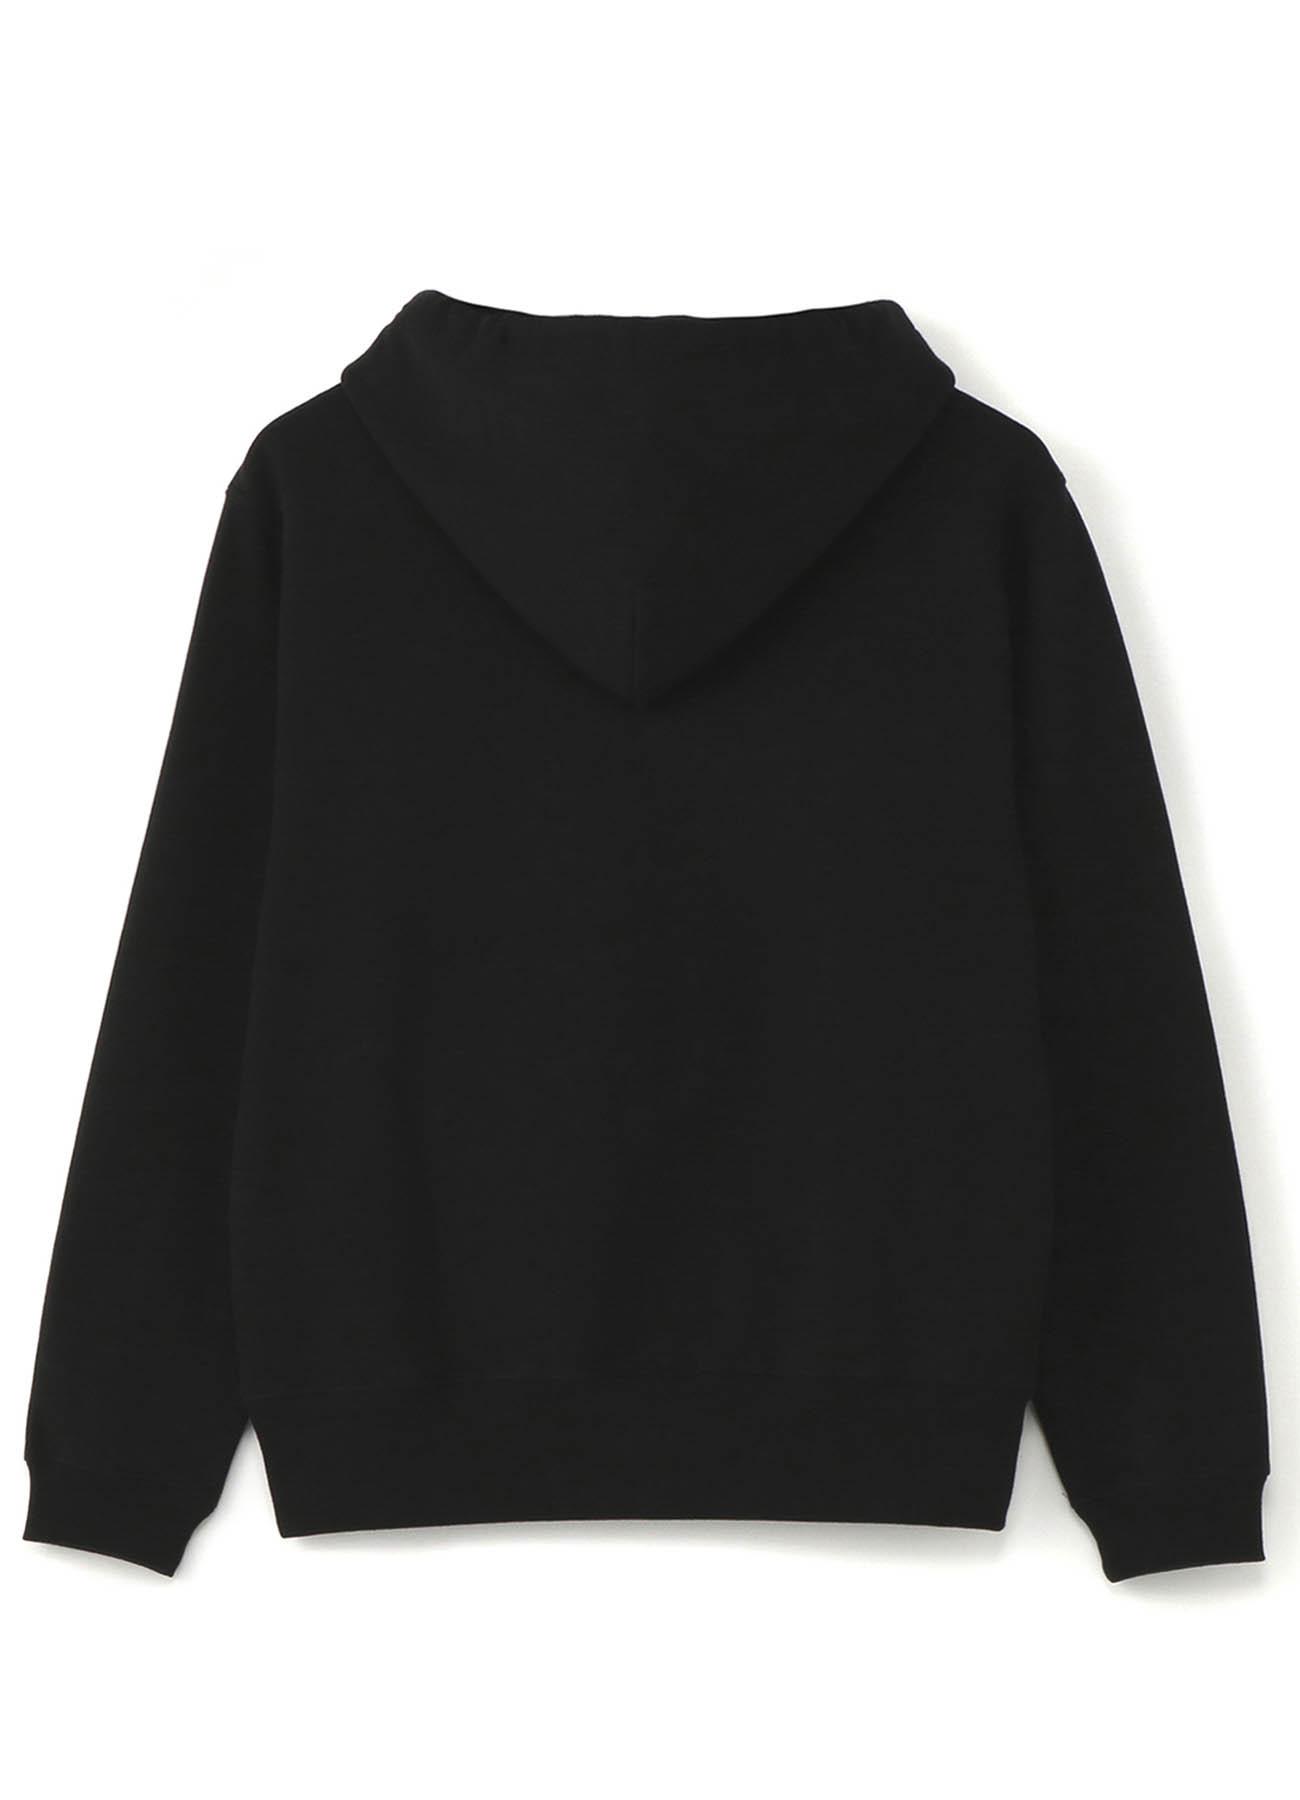 10.0oz棉质GY标志兜帽